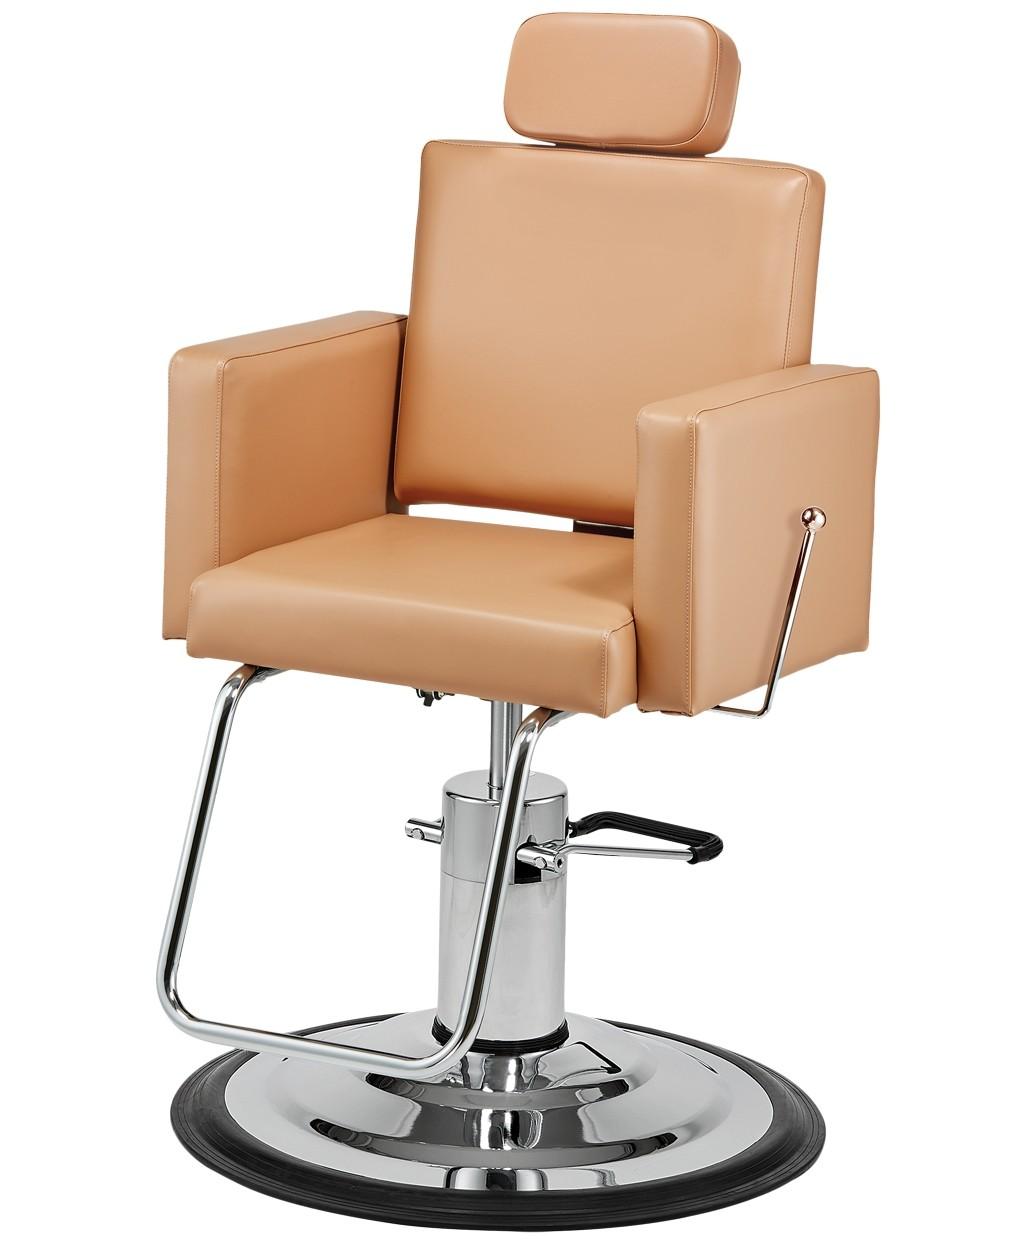 Pibbs 3447 Cosmo Threading Chair